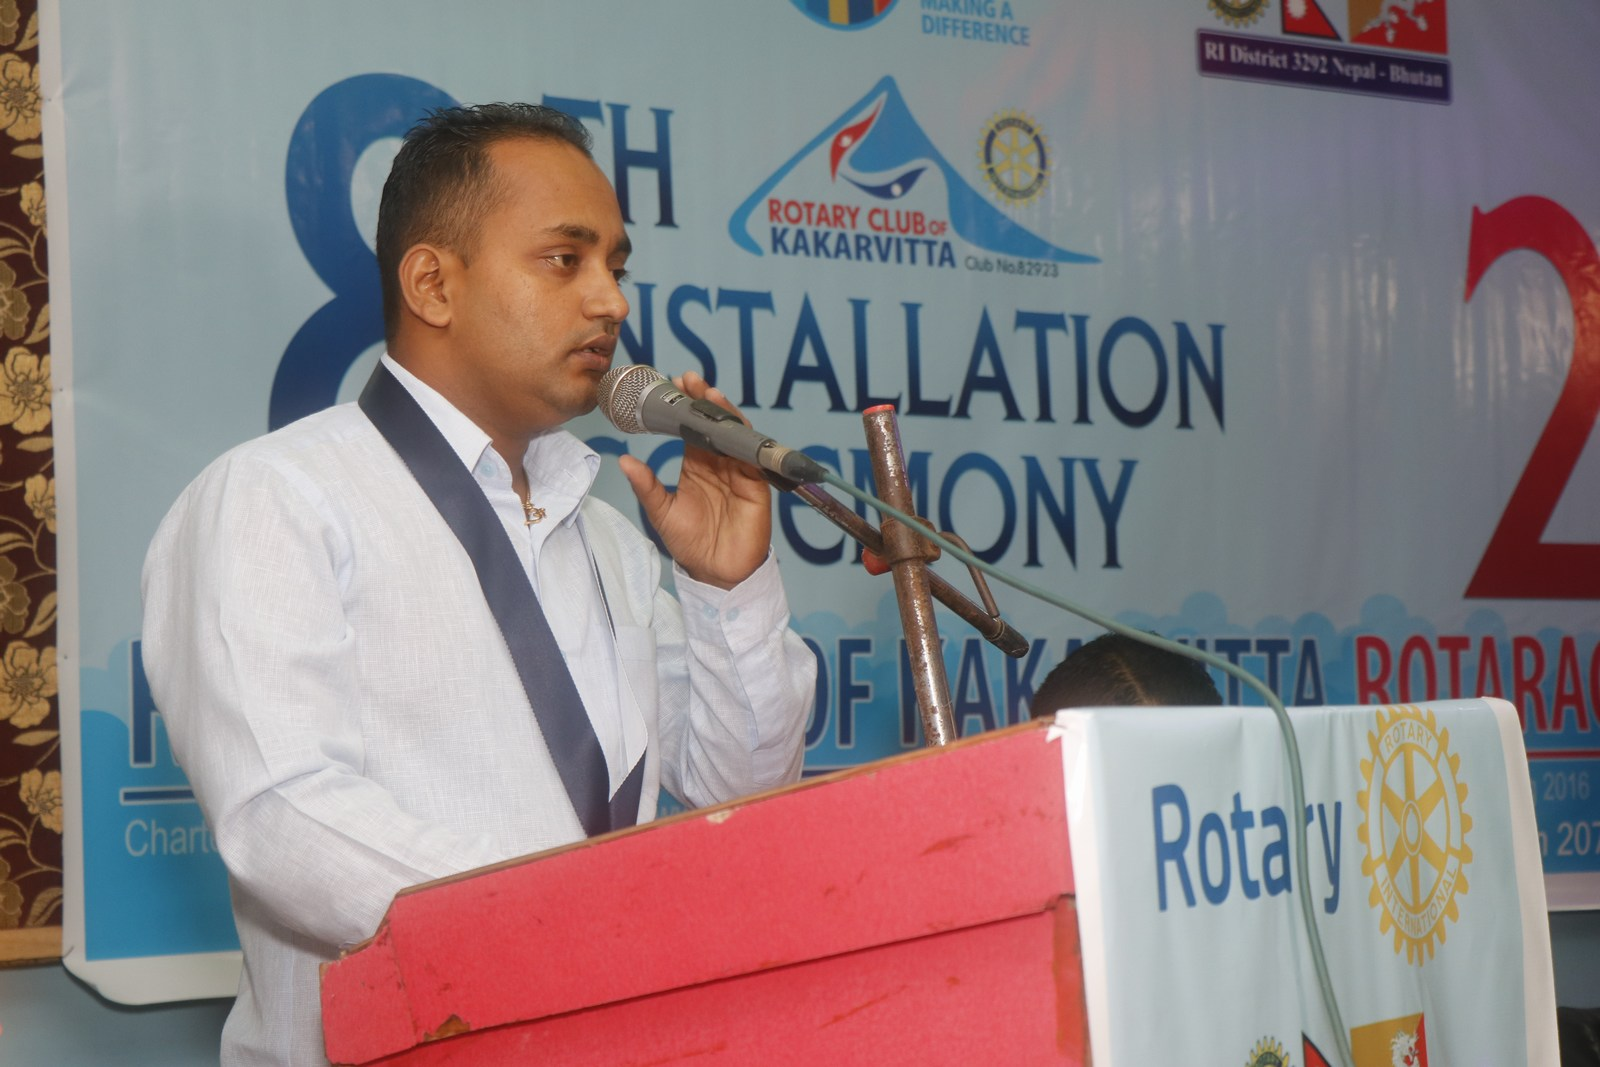 8th-Installation-Ceremony-Rotary-Club-of-Kakarvitta-63